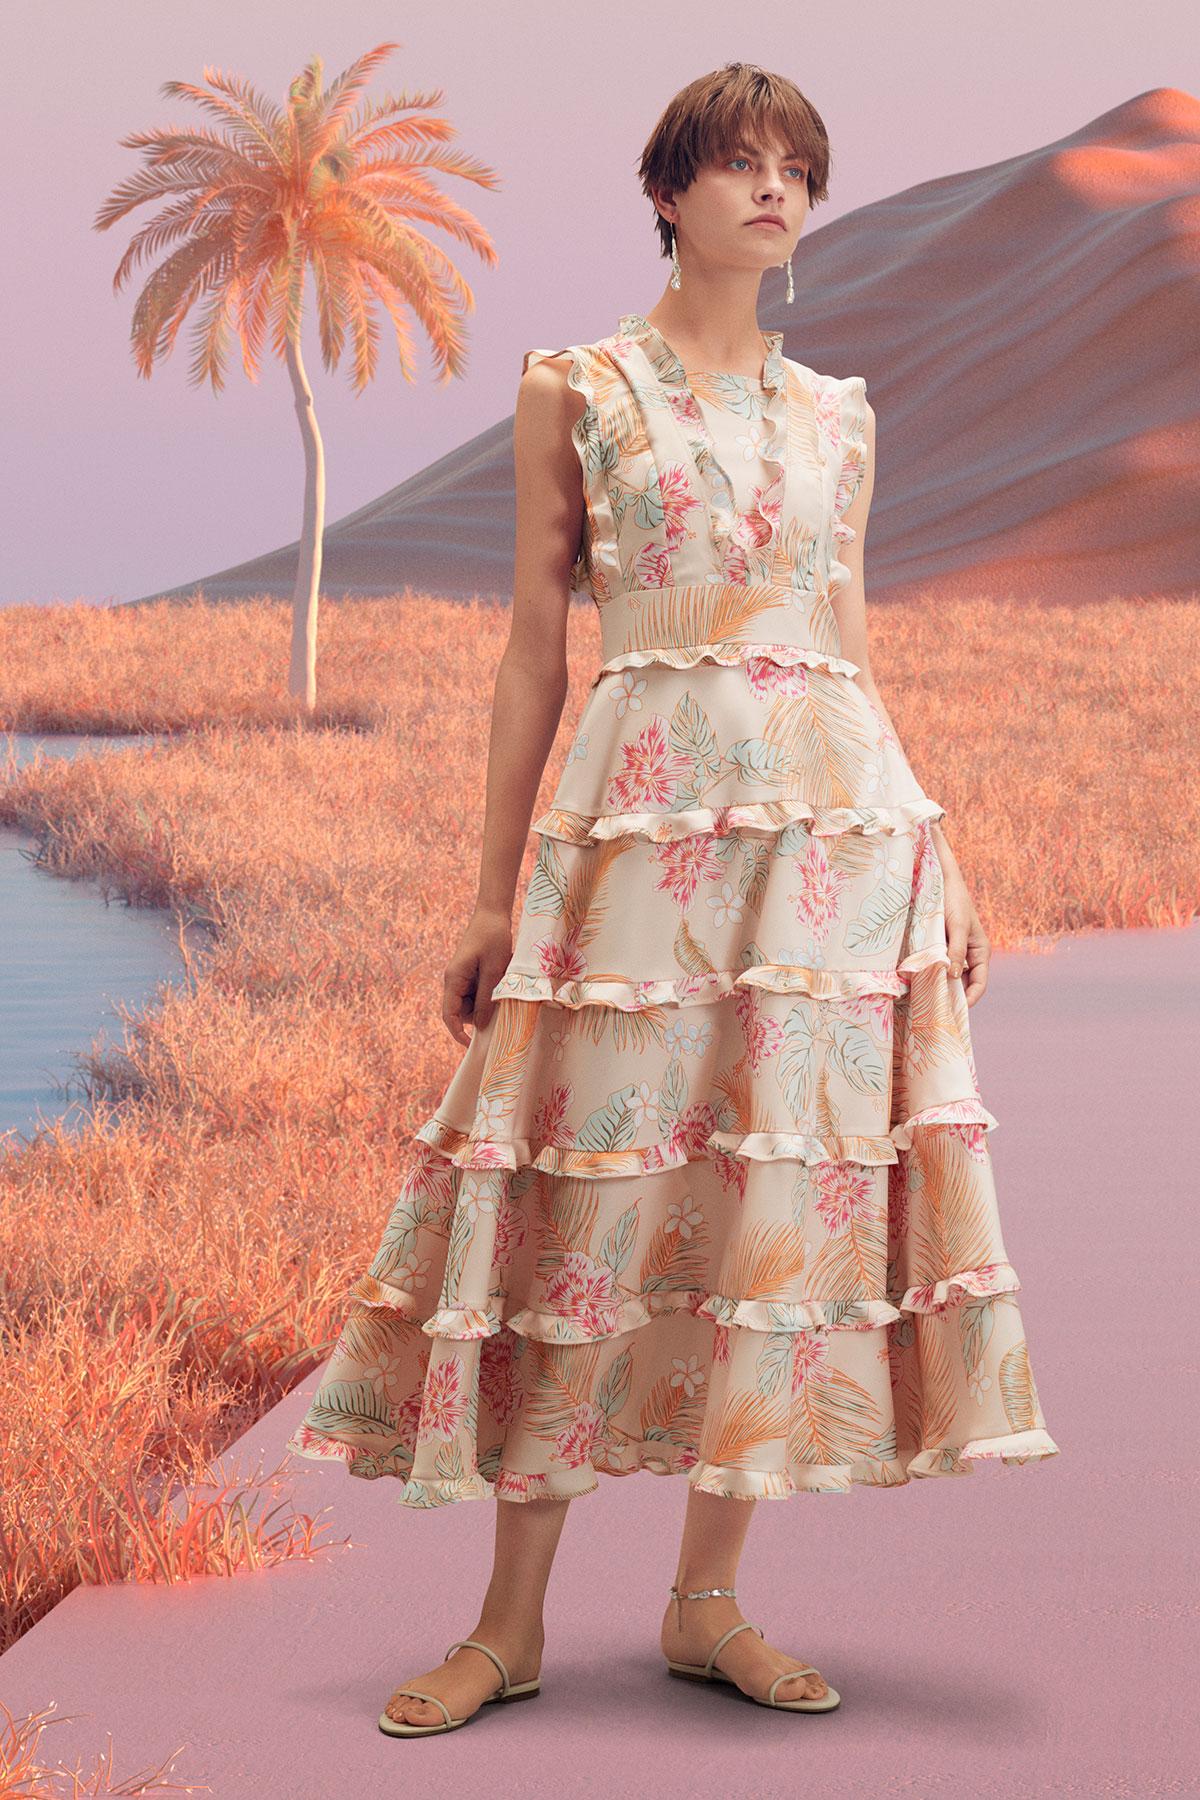 ADEAM Spring/Summer 2022 Collection